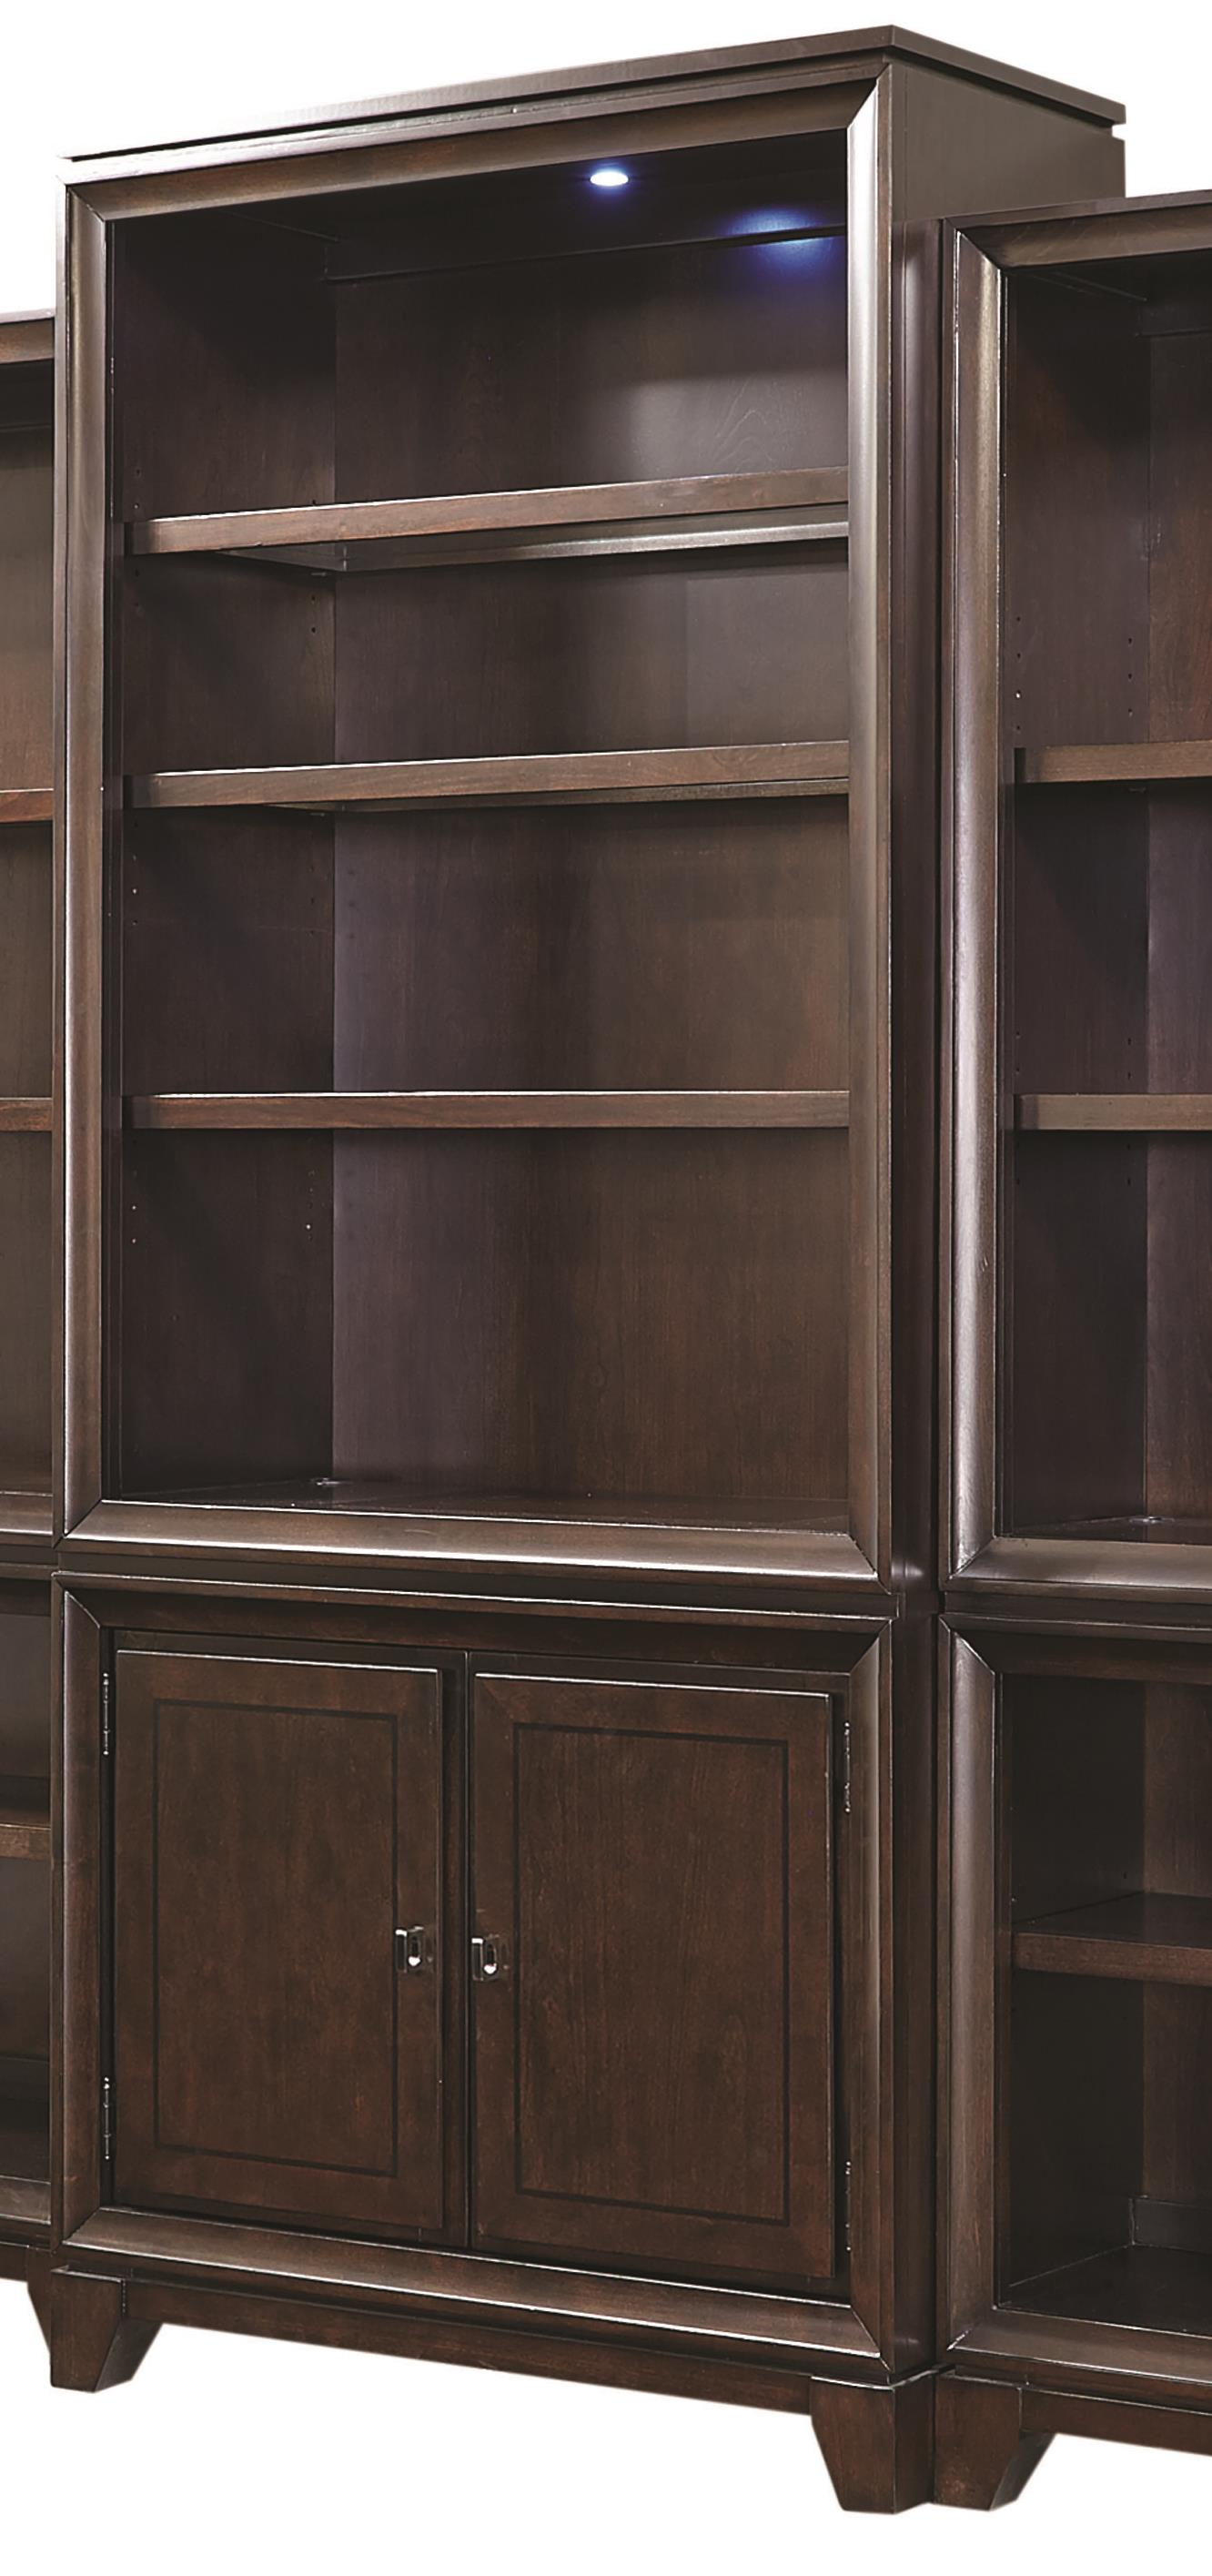 "Aspenhome Viewscape 84"" Door Bookcase  - Item Number: I73-336"